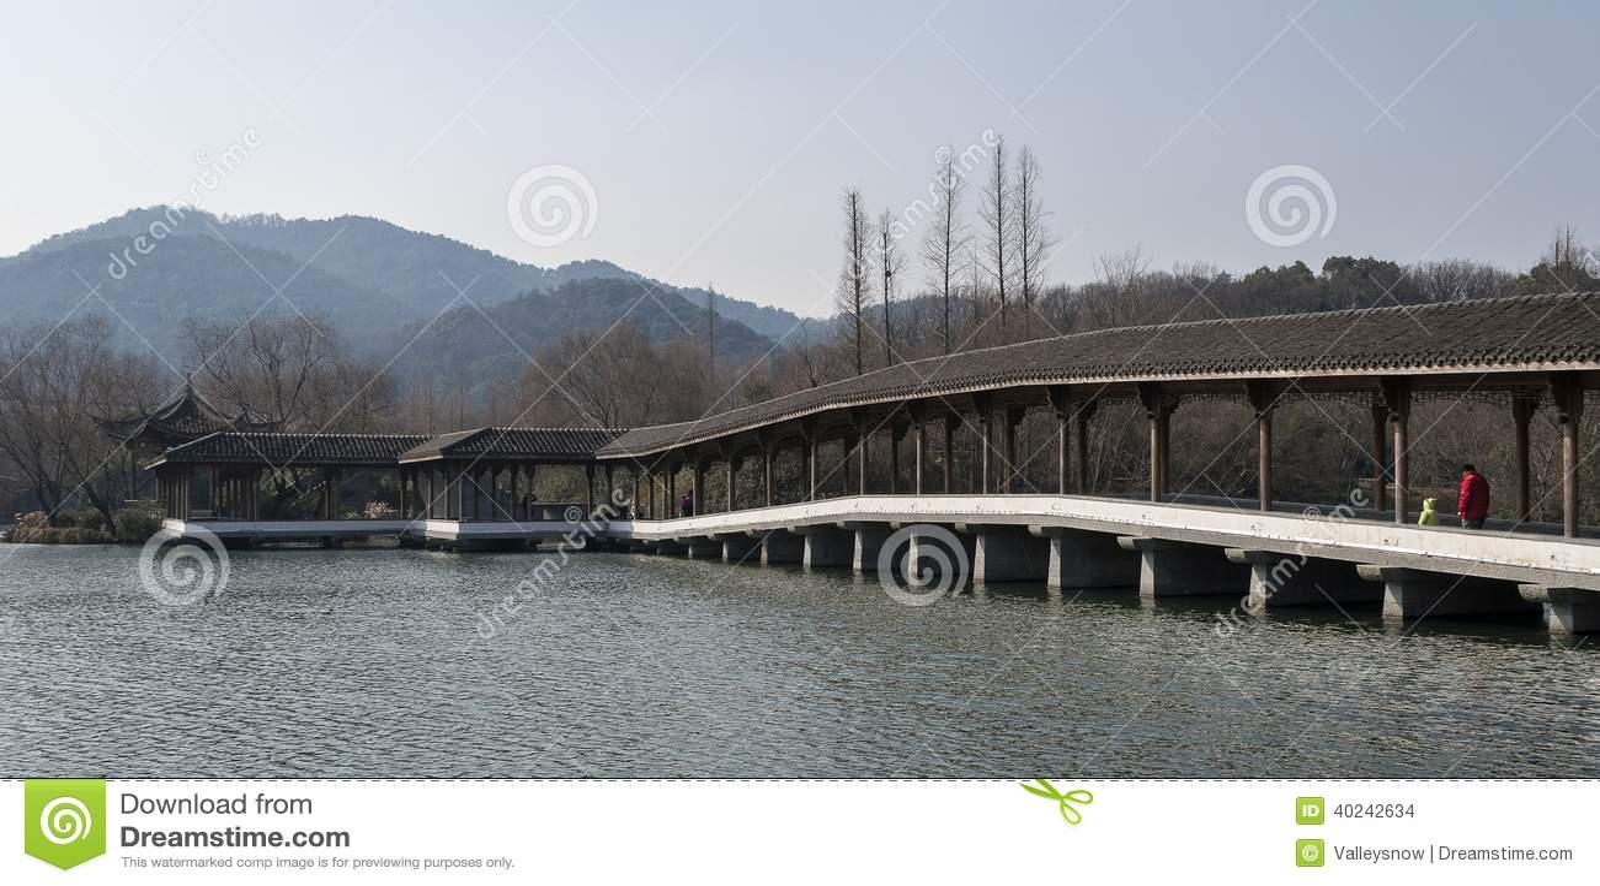 Hangzhou West Lake Scenic Area Stock Photo